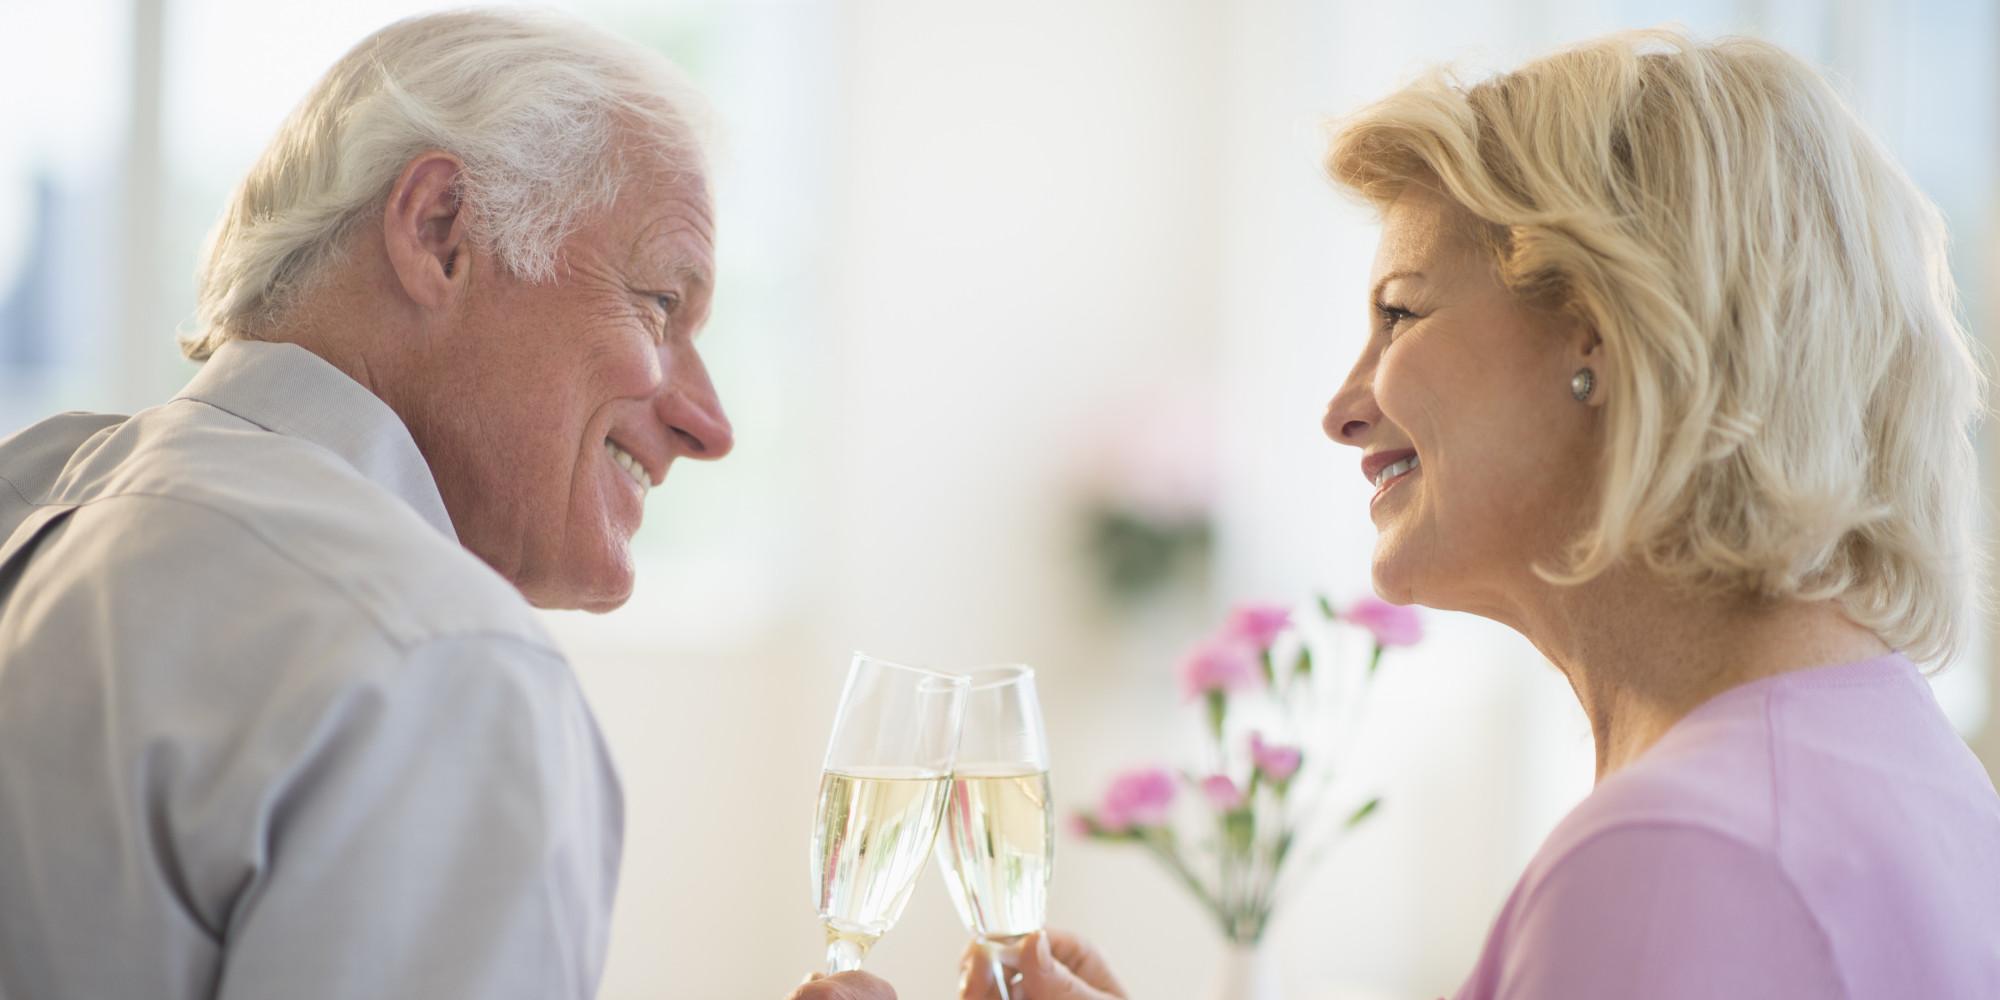 panemune senior singles Gay dating website for senior singles looking for love we connect gay seniors on key dimensions like beliefs & values for longer relationships join free.